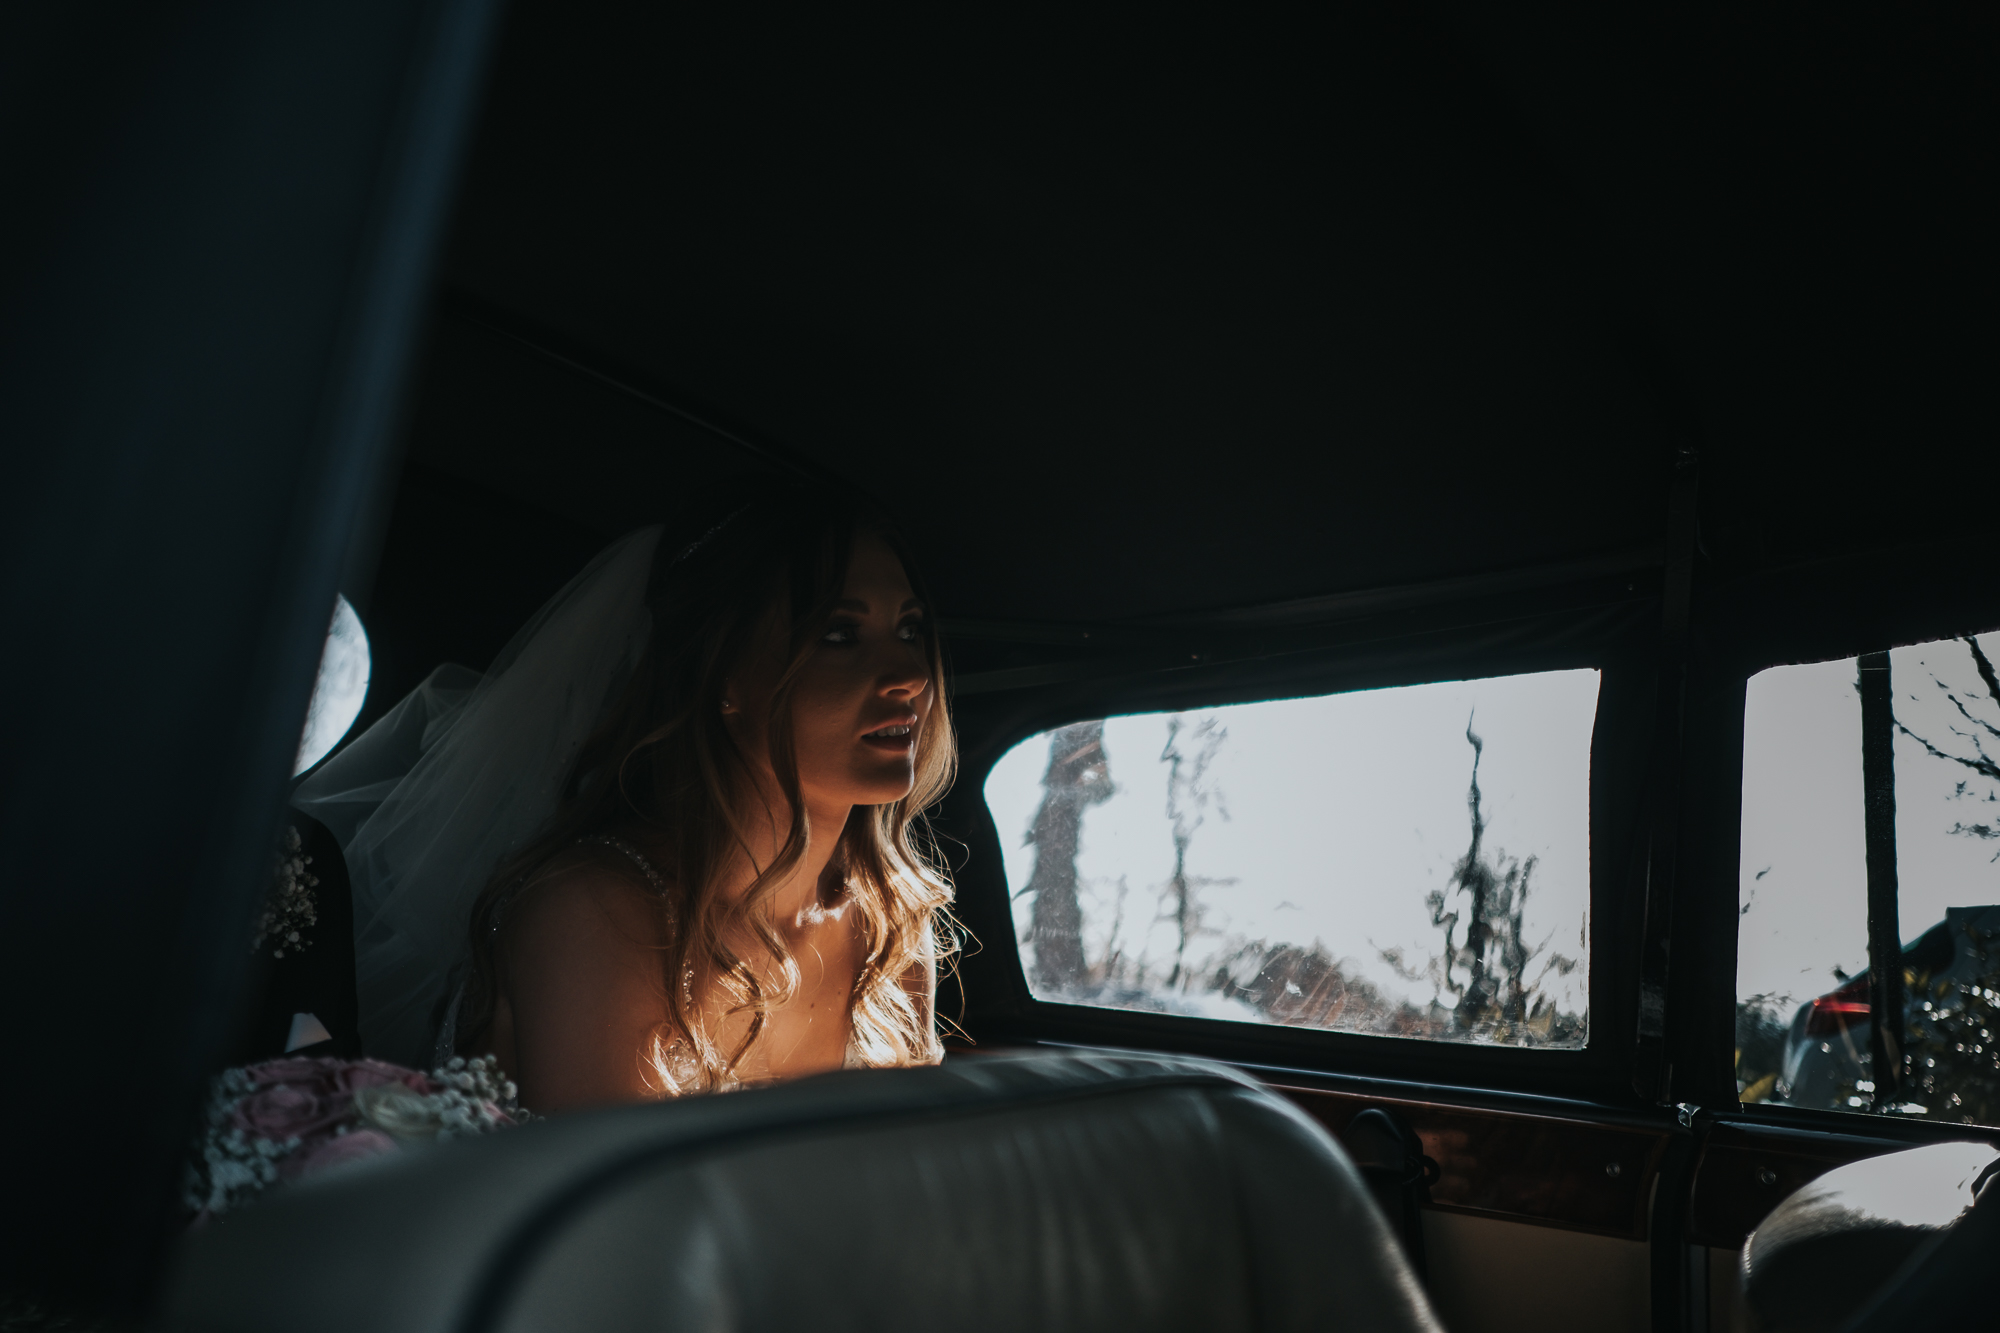 West Tower Exclusive Wedding Venue wedding photography merseyside and lancashire wedding photographer (19 of 60).jpg